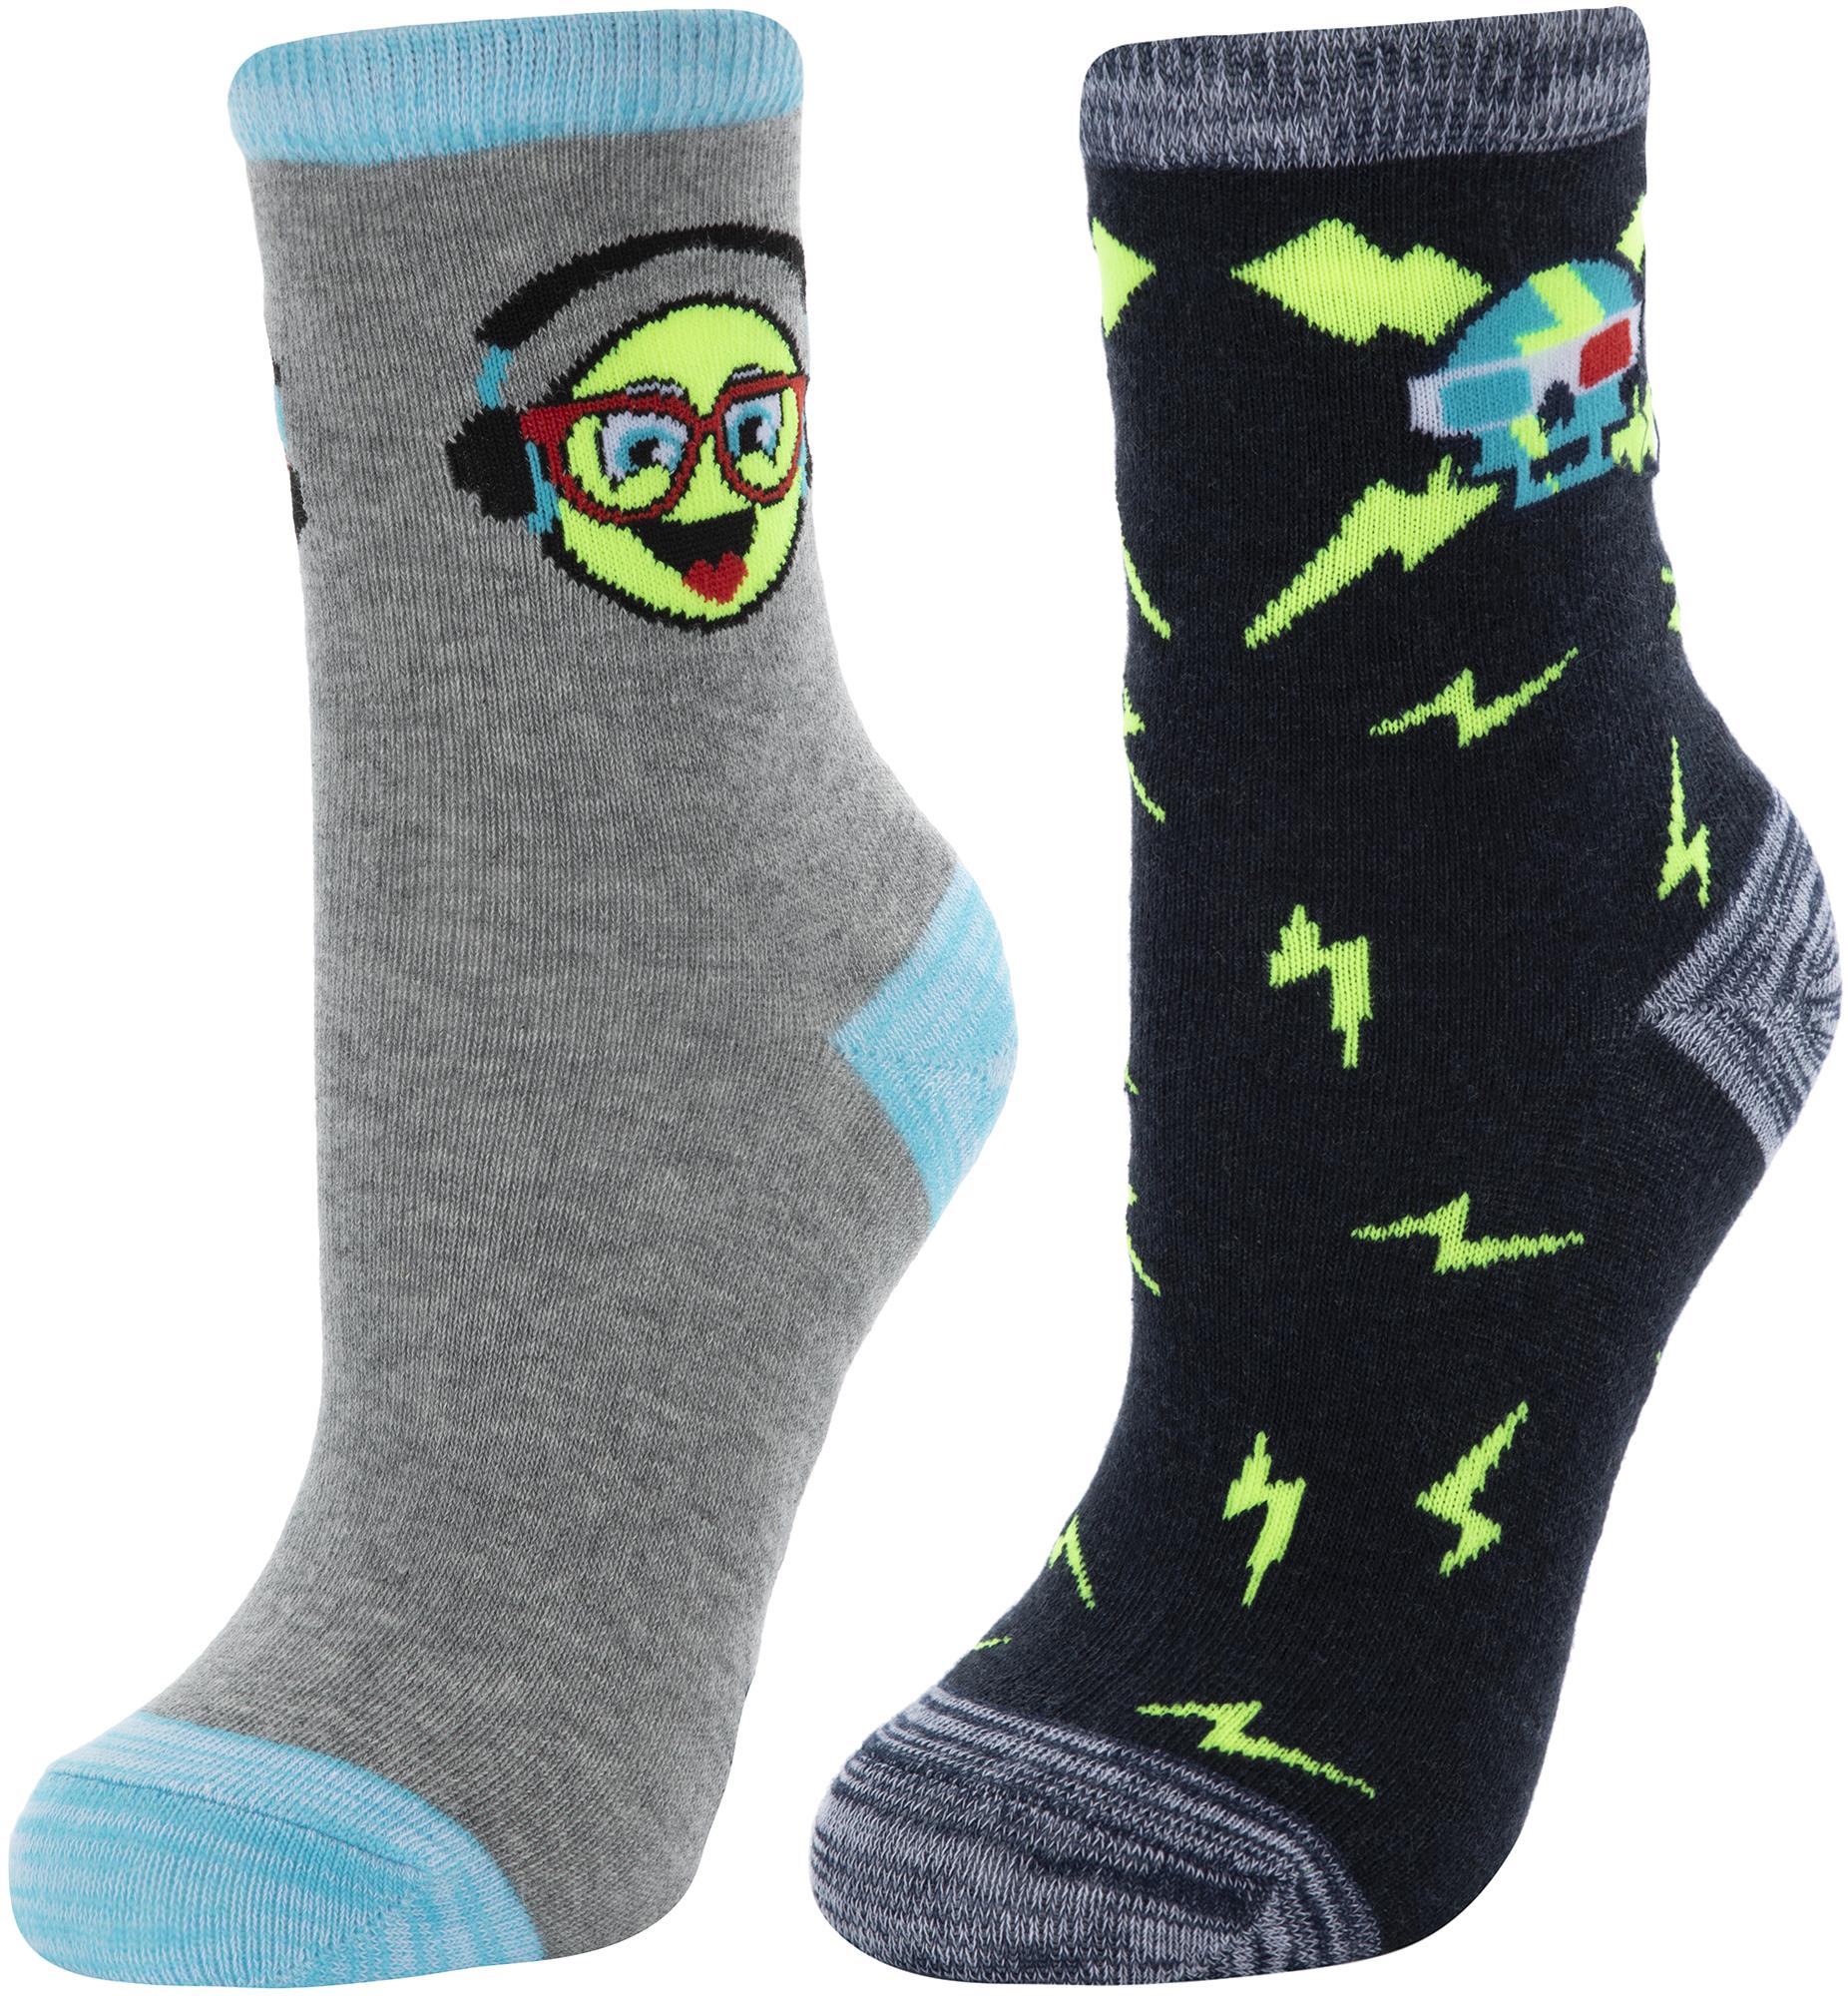 Skechers Носки для мальчиков Skechers, 2 пары, размер 24-35